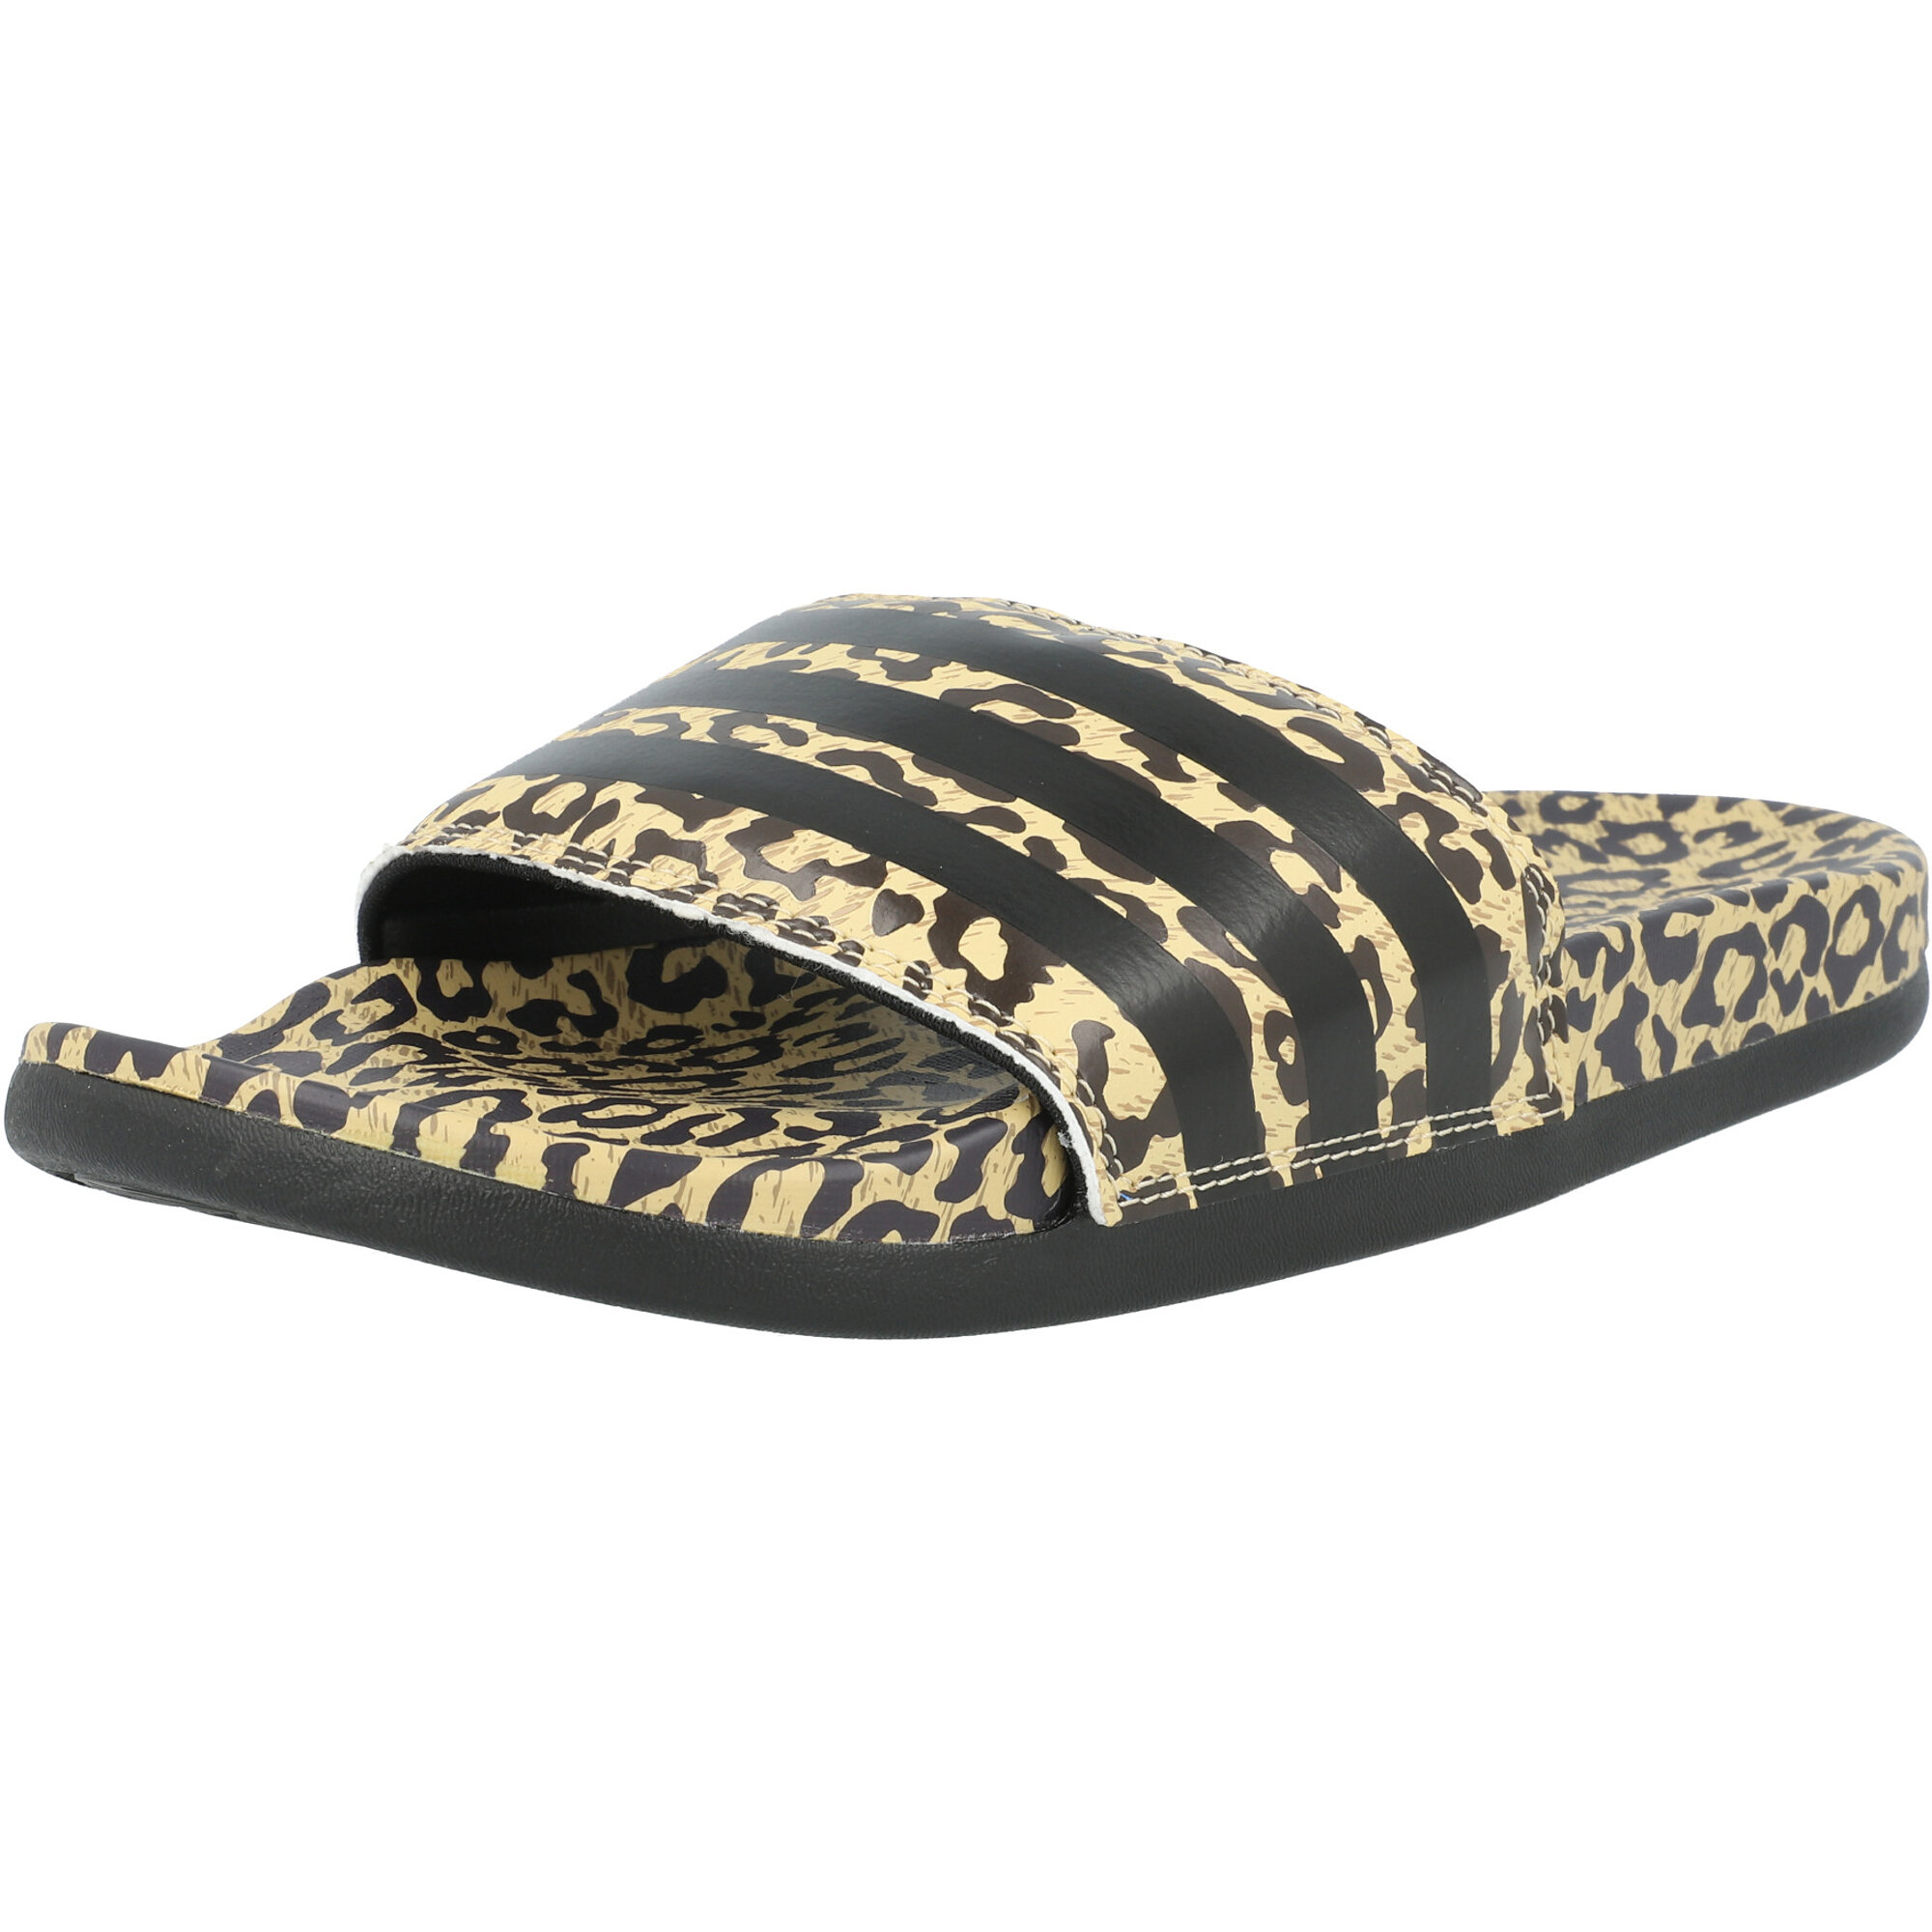 adidas adilette Comfort Beige/Core Black Synthetic